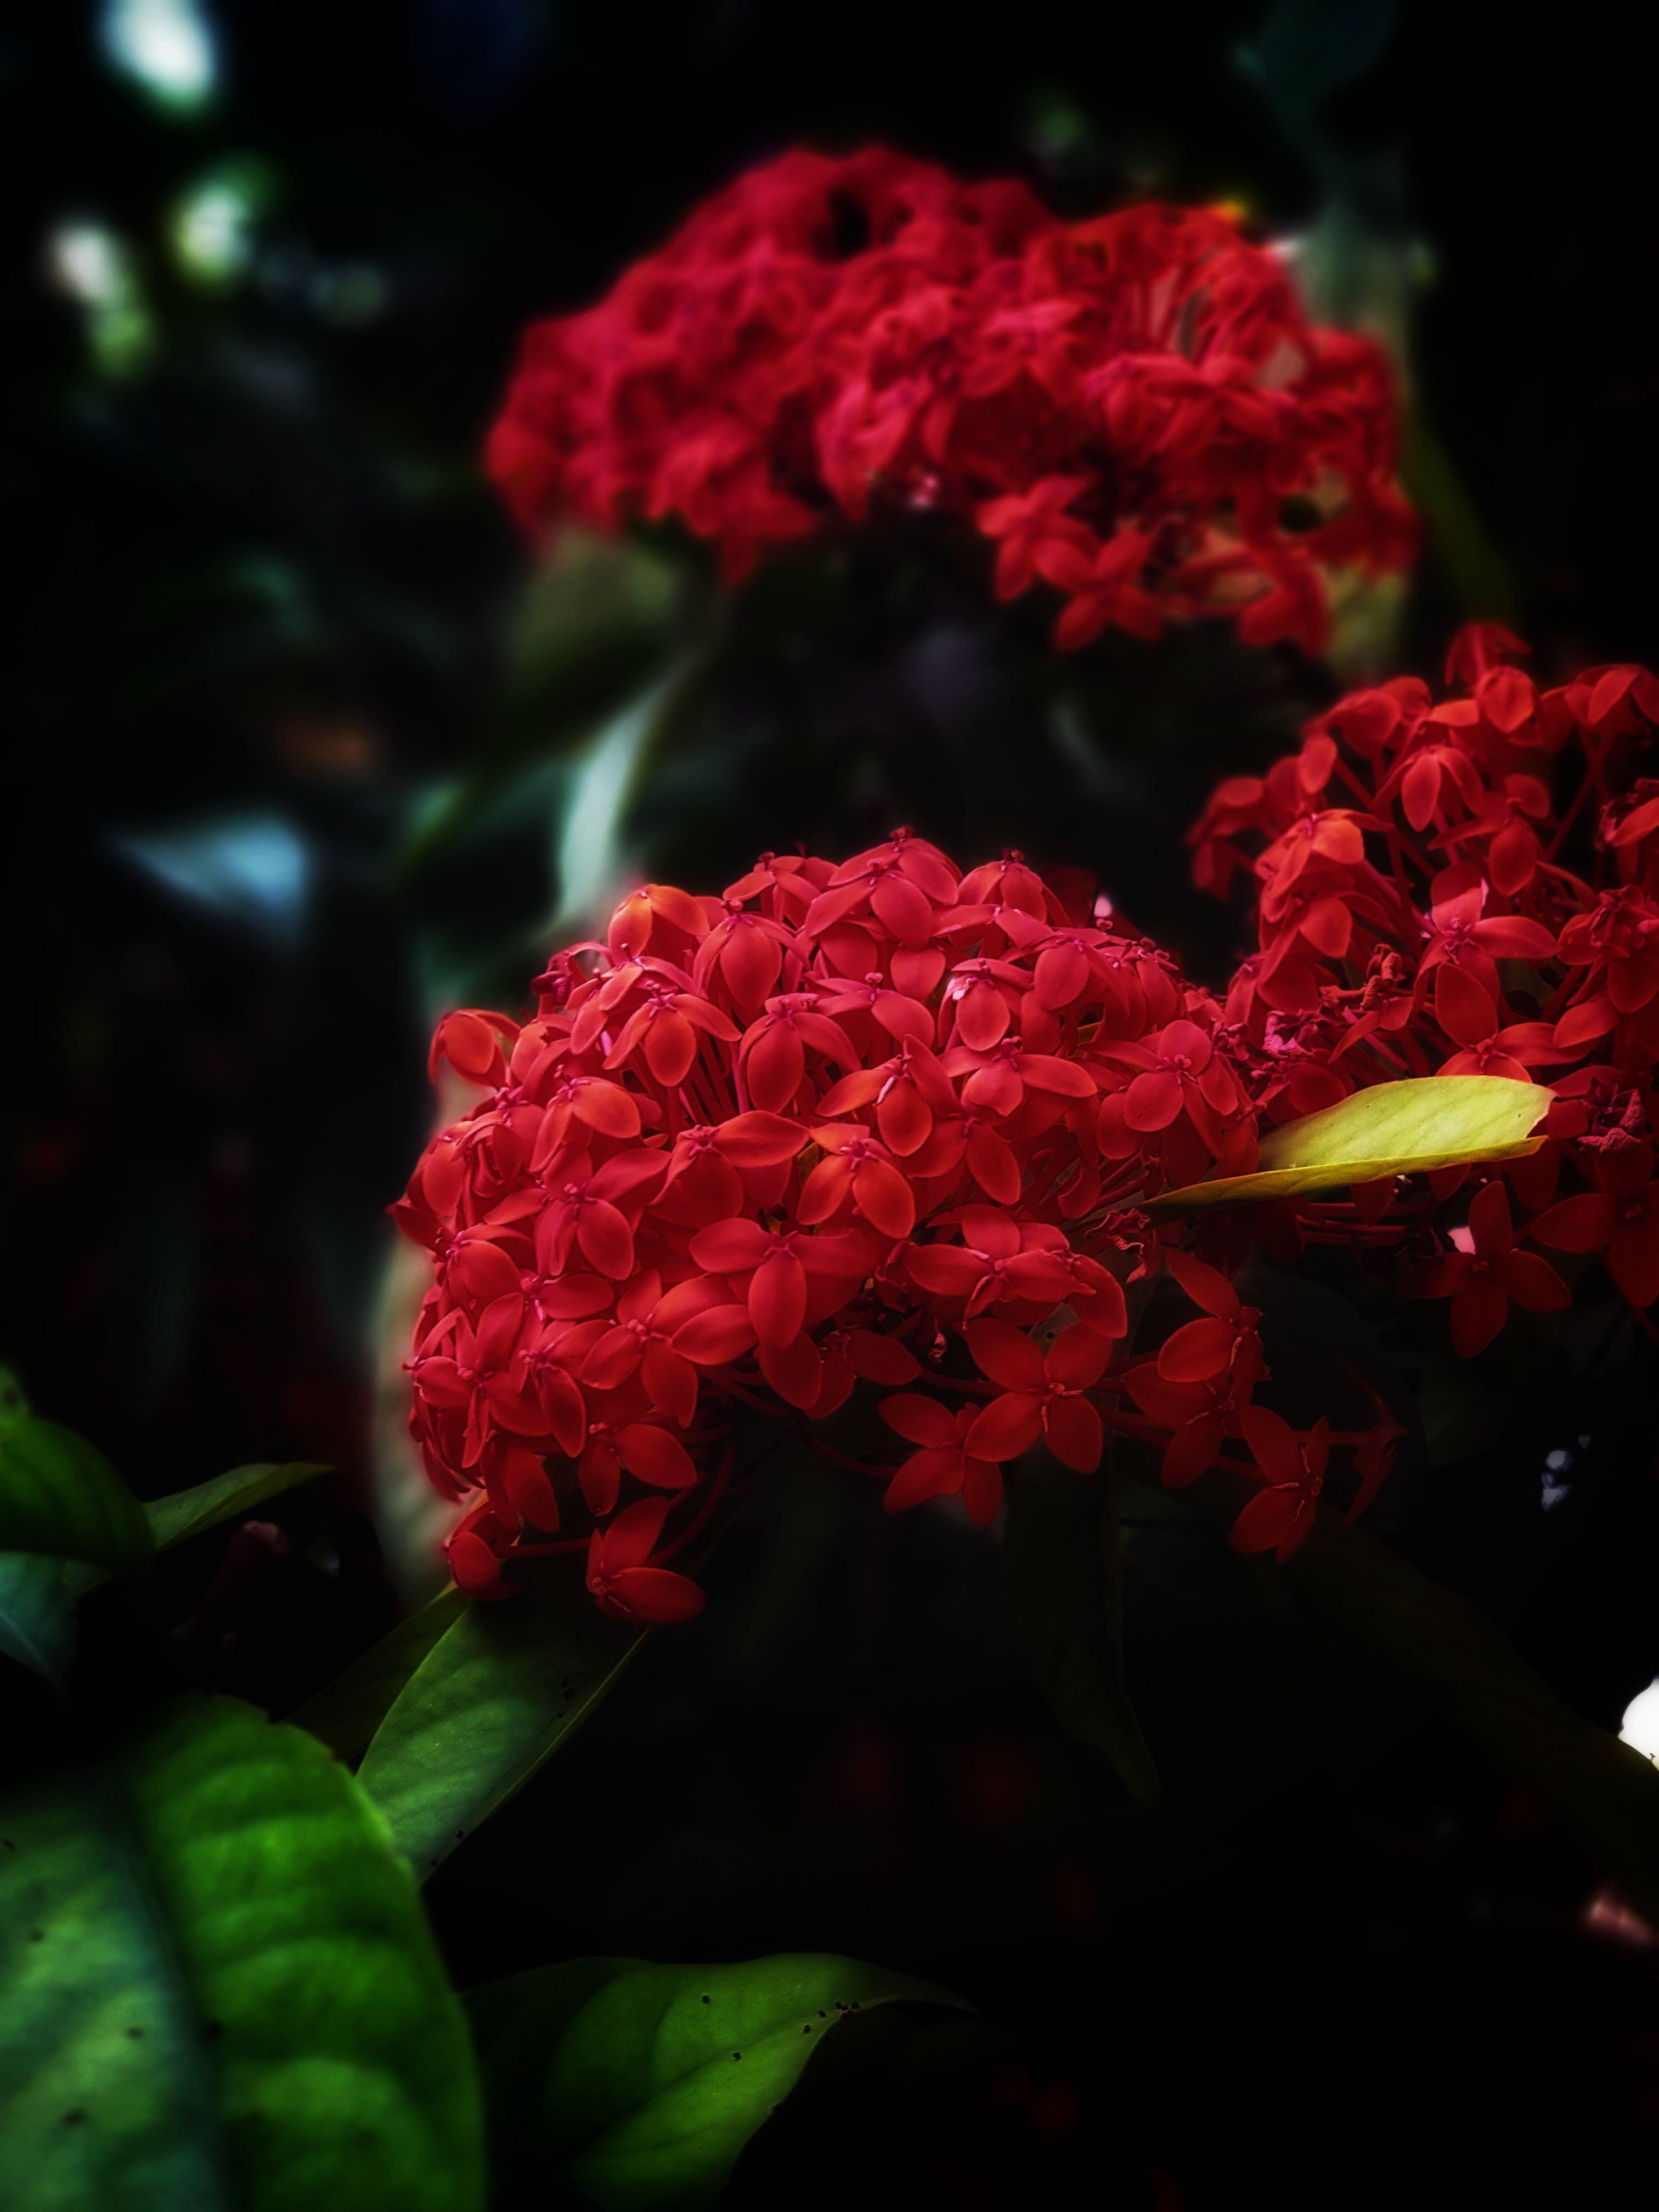 Free stock photo of #mobilechallenge, beautiful flowers, bunch of flowers, dark green